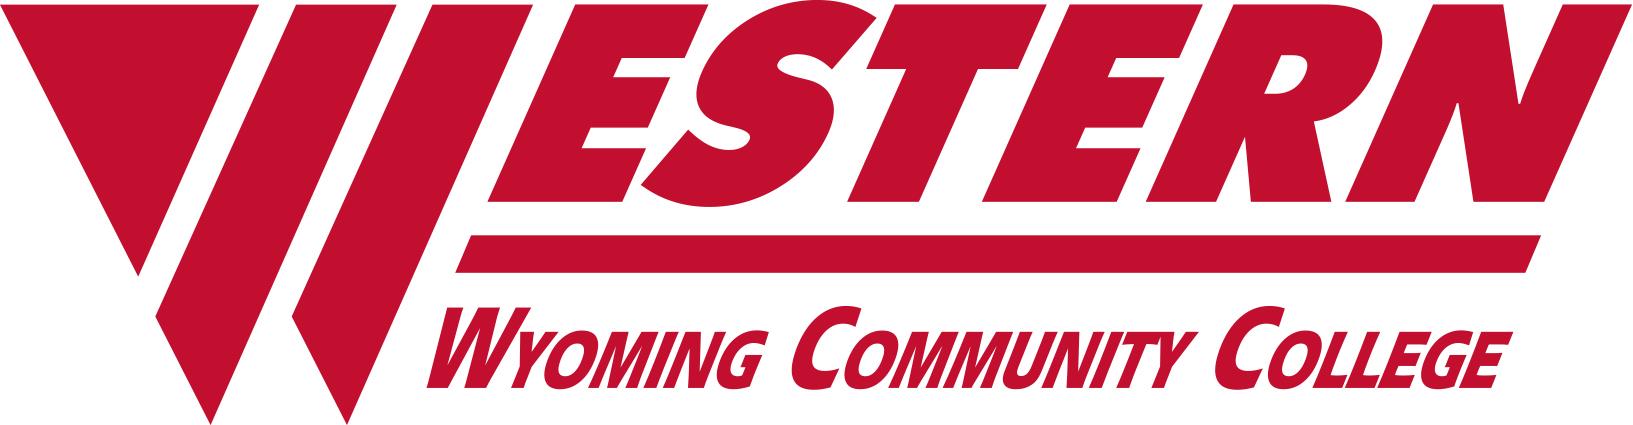 Western Logo Red (2)